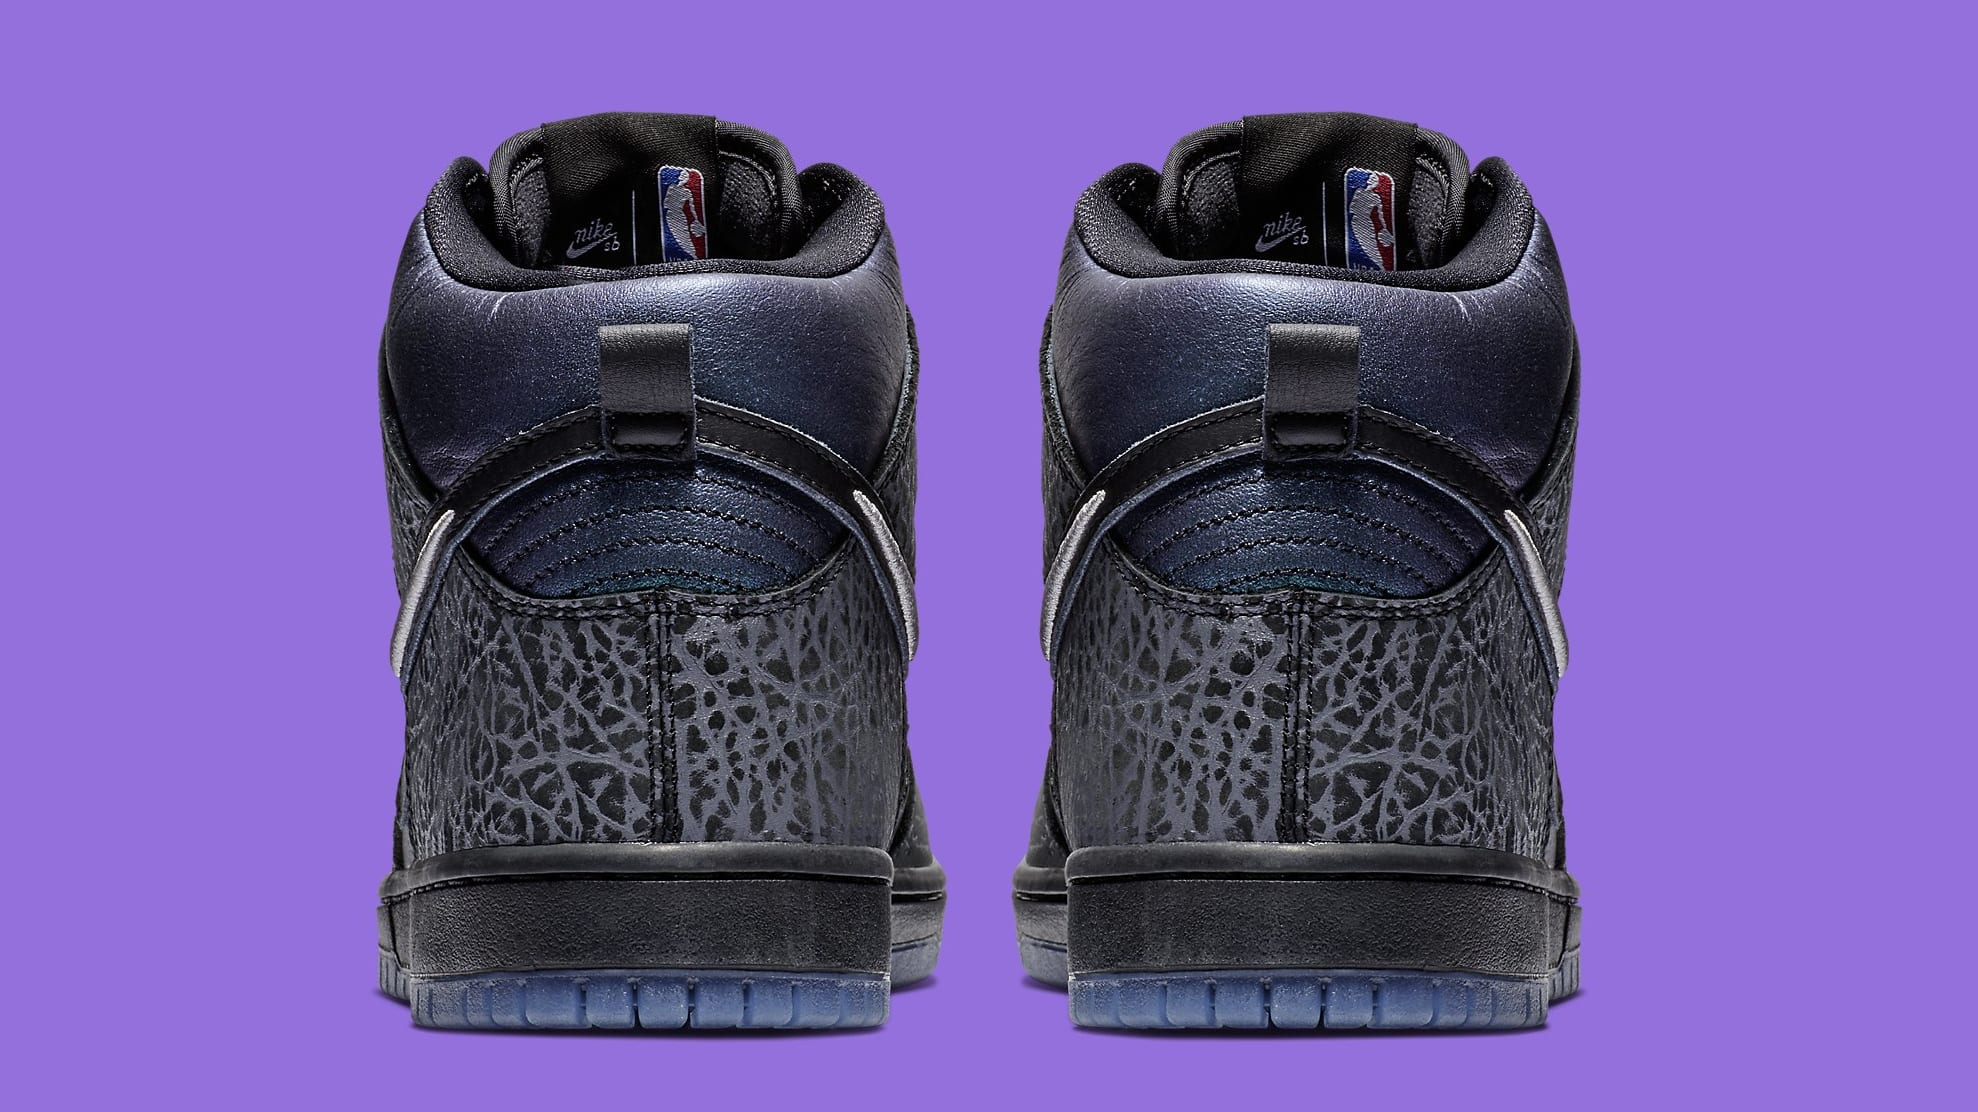 052159b6 Black Sheep x Nike SB Dunk High 'Black Hornet' Release Date   Sole Collector